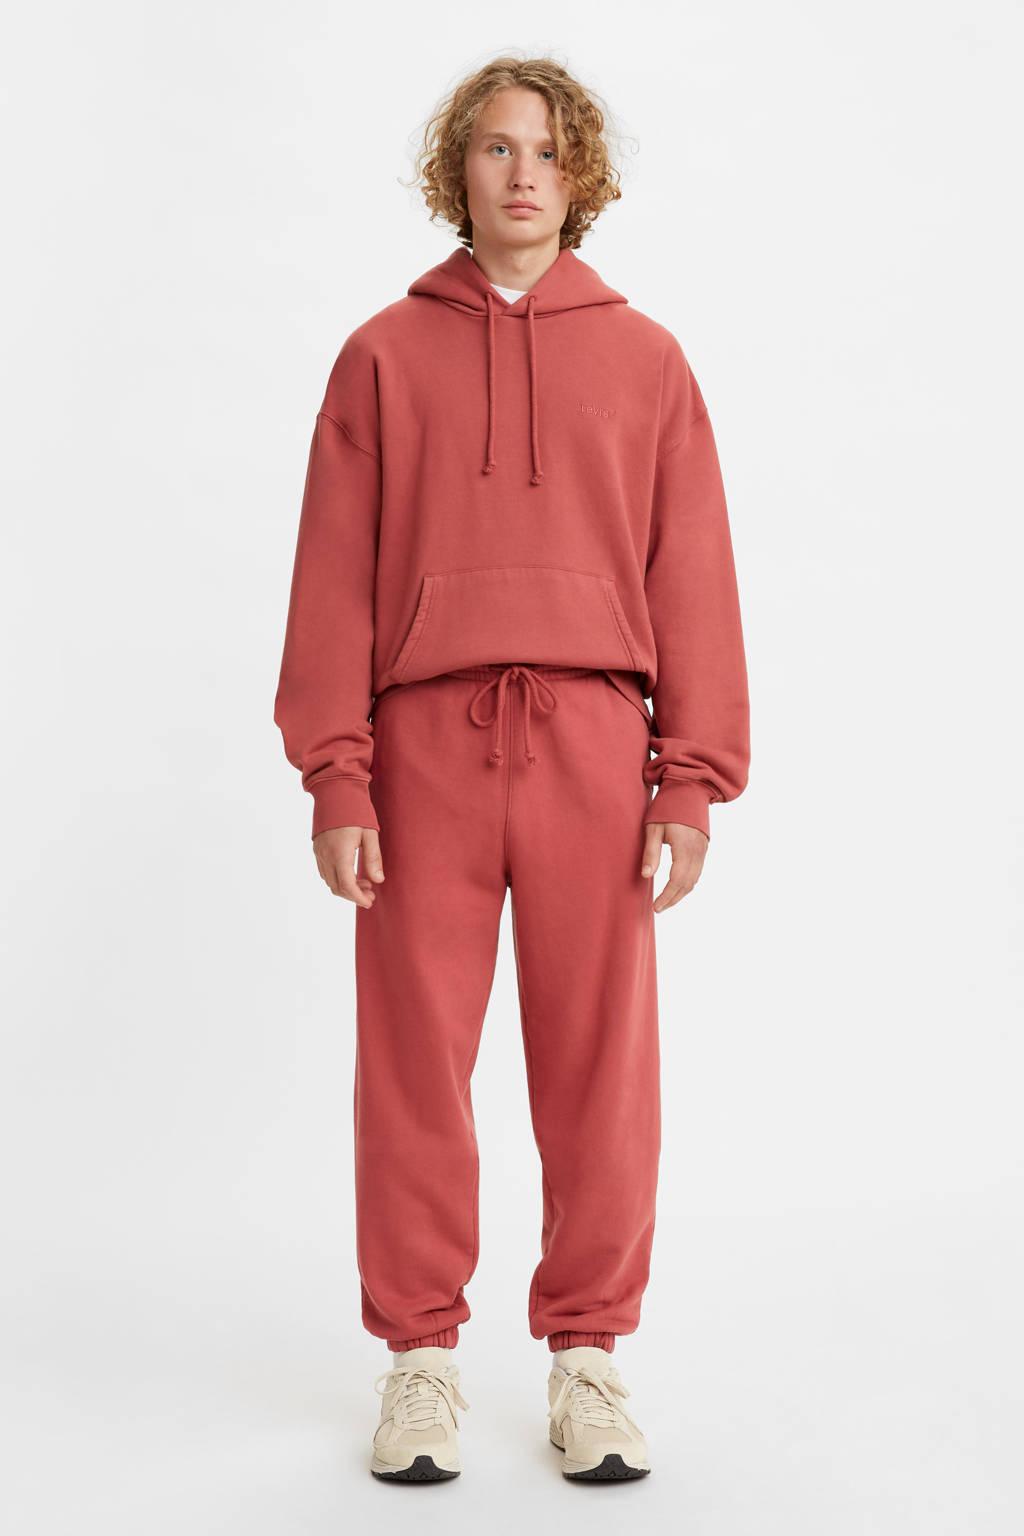 Levi's RED TAB  regular fit joggingbroek marsala garment dye, Marsala Garment Dye